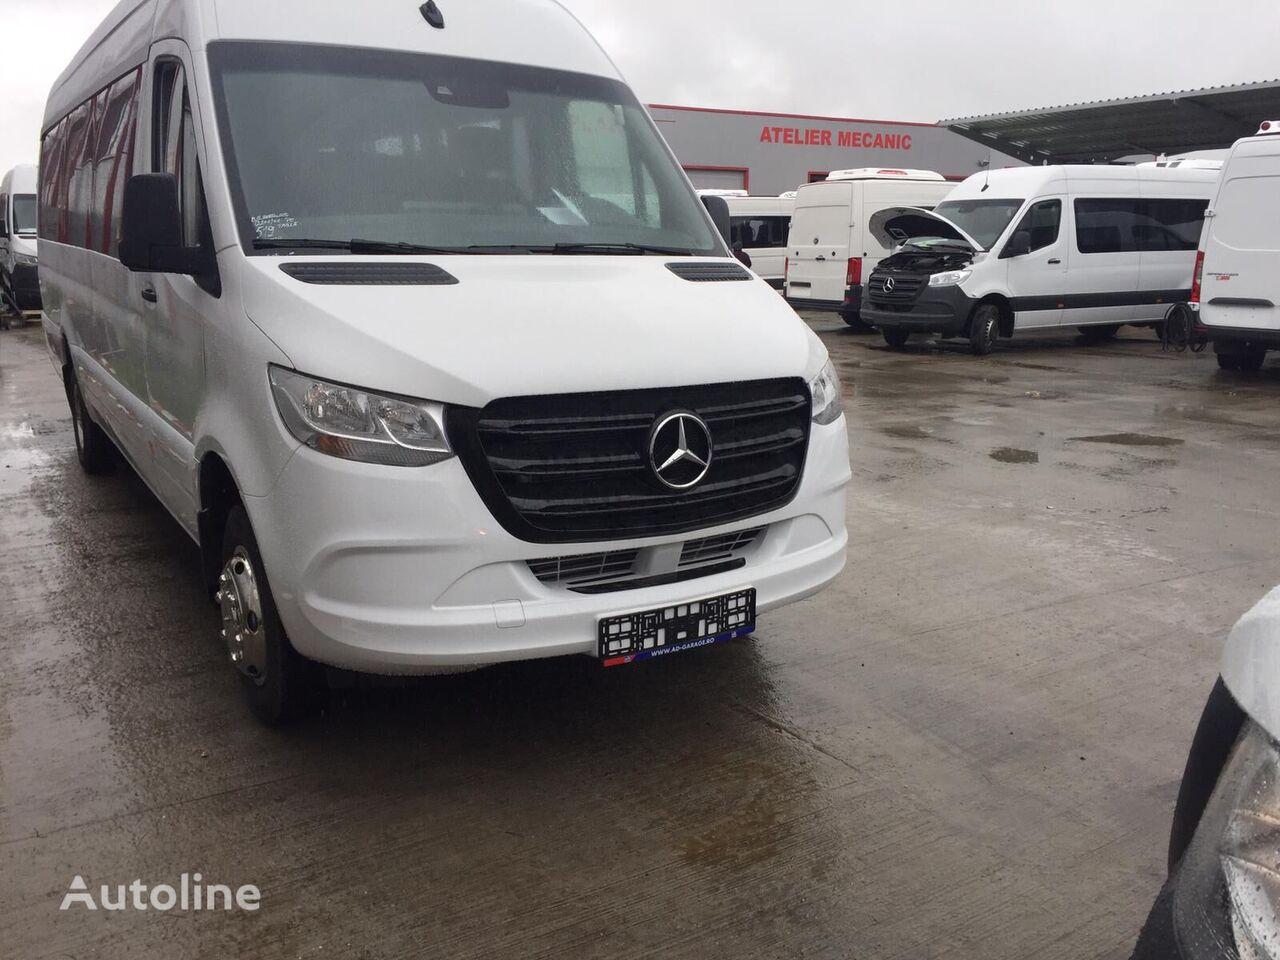 new MERCEDES-BENZ Sprinter IDILIS 516,  22+1+1  *COC*  prolonged with 50cm fiber/s passenger van